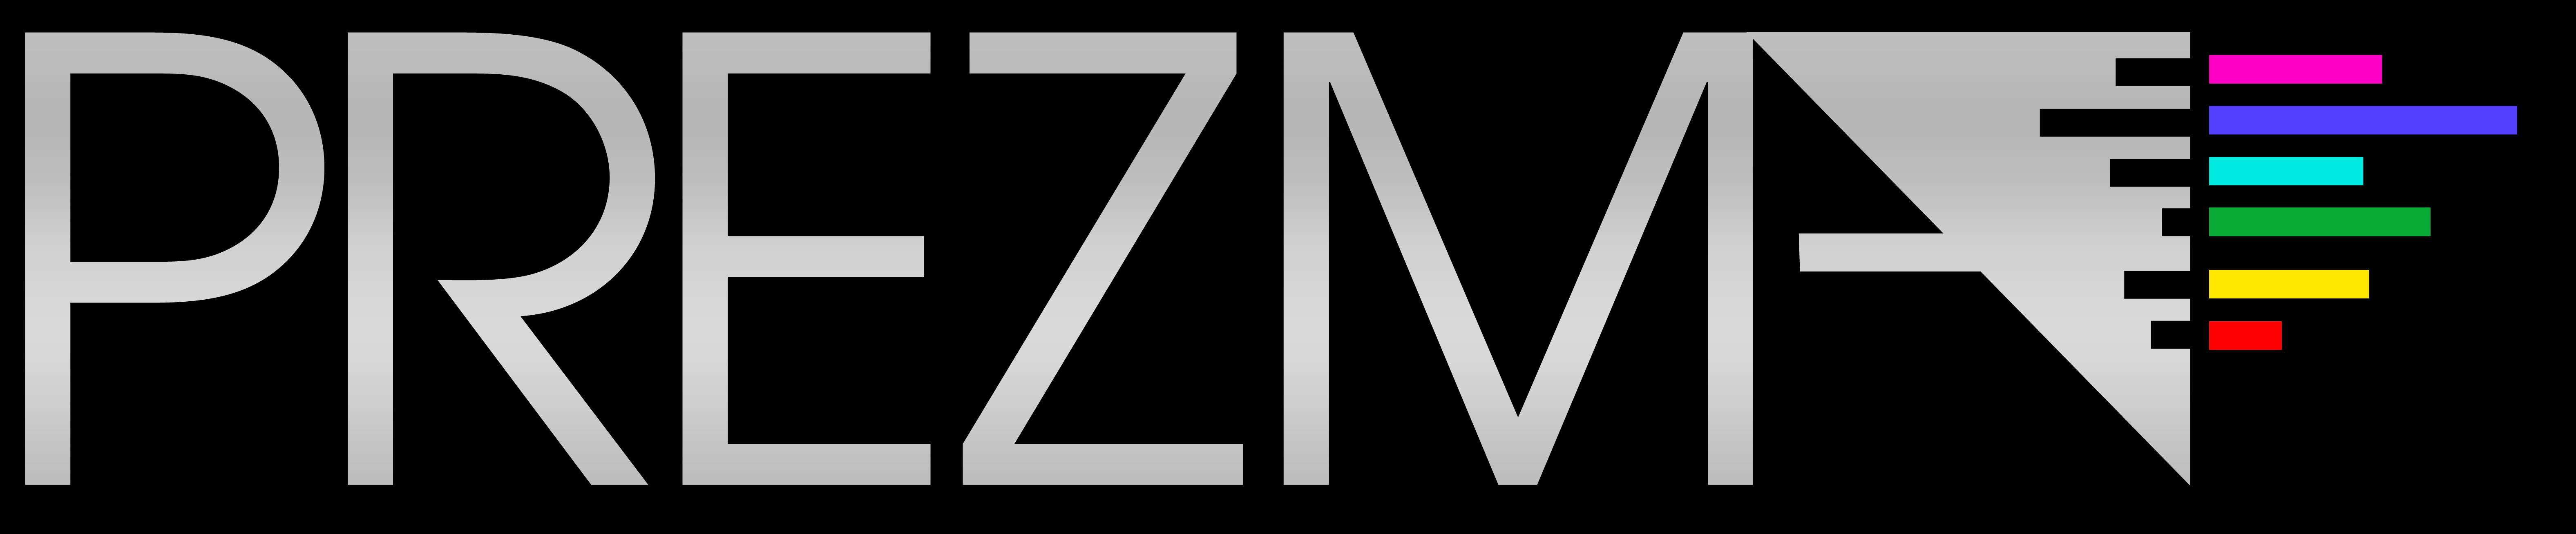 logo-HD-BLACK